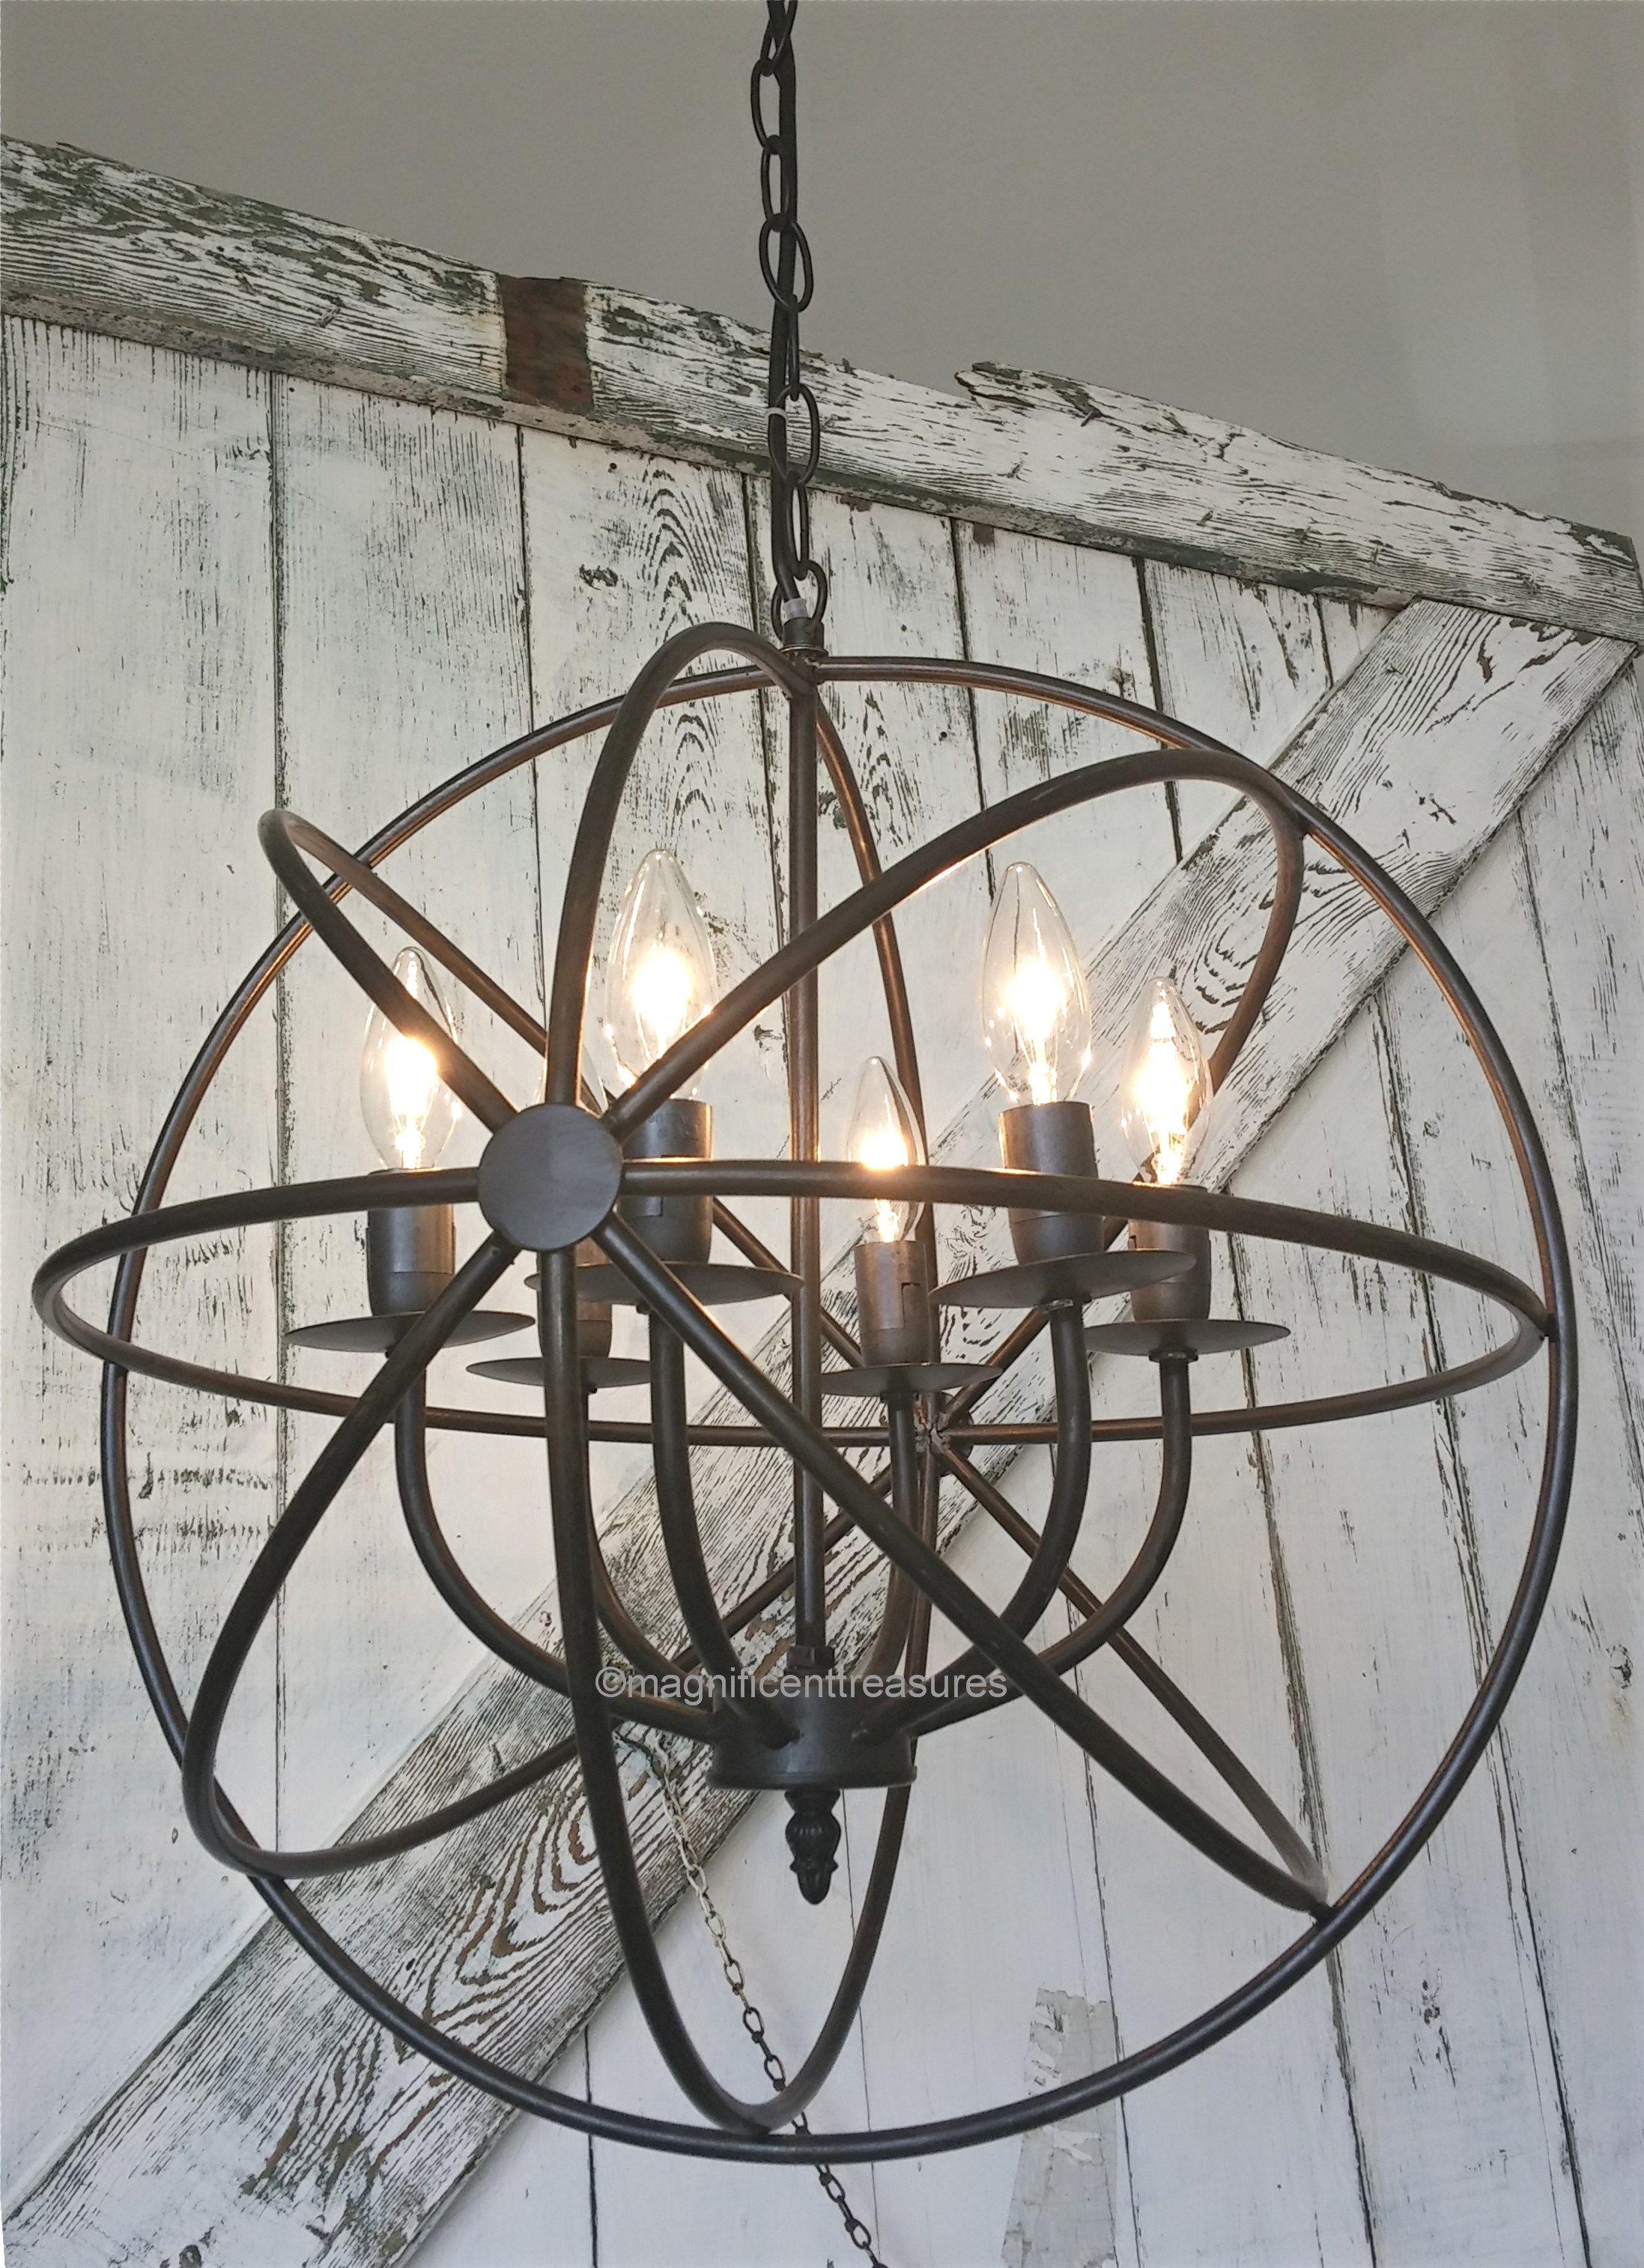 Industrial Rustic Metal Round Armillary Sphere Chandelier Light